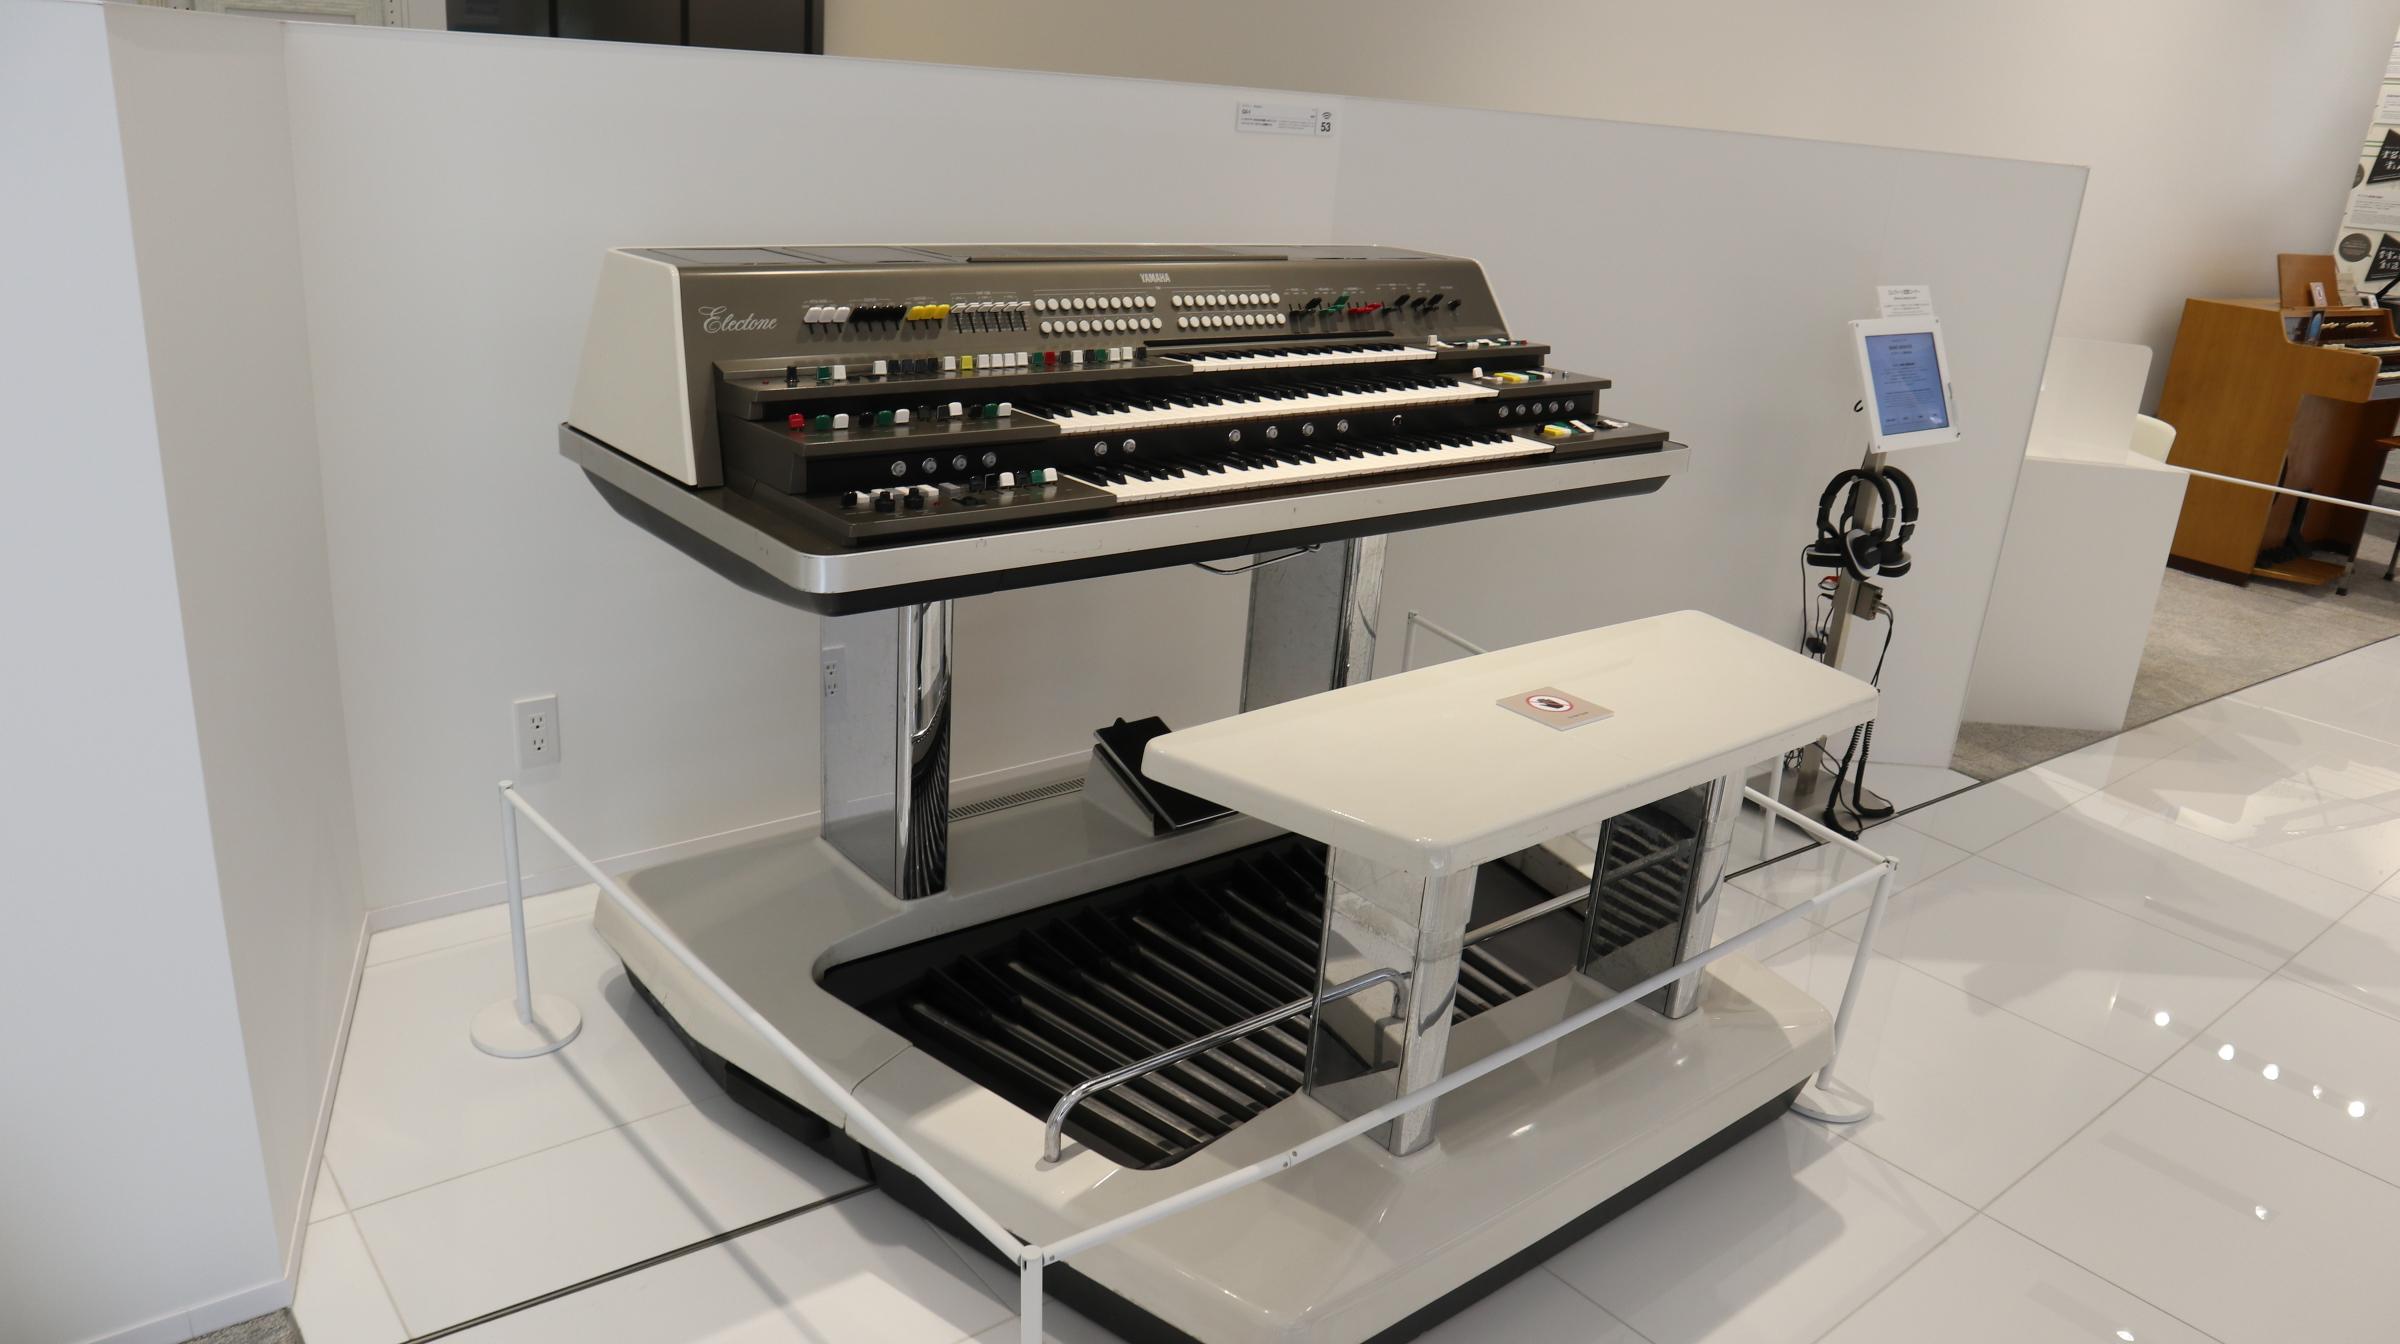 Yamaha GX-1, the precursor to the CS-80